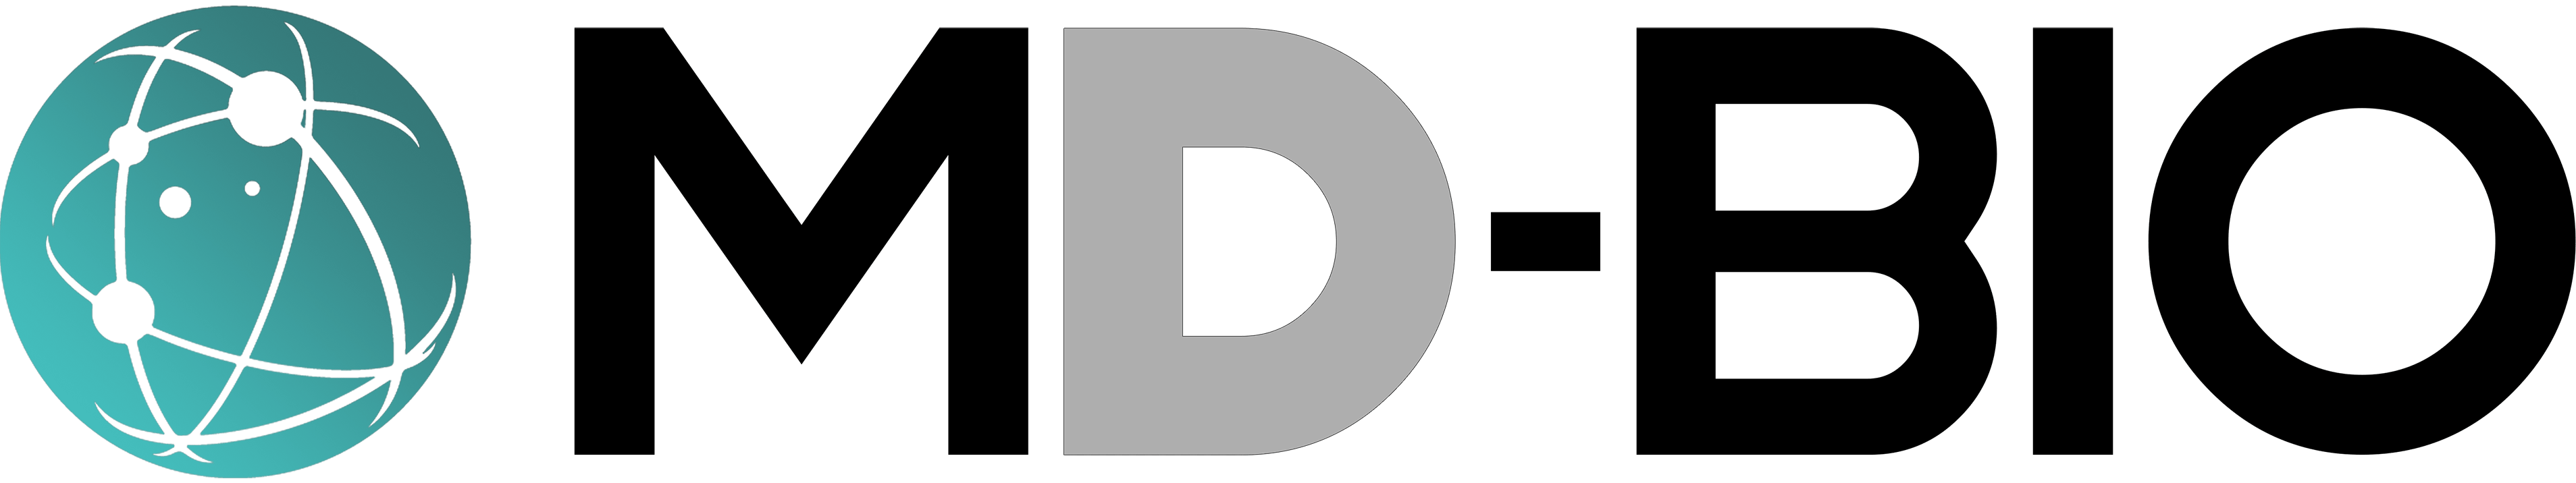 MD-BIO